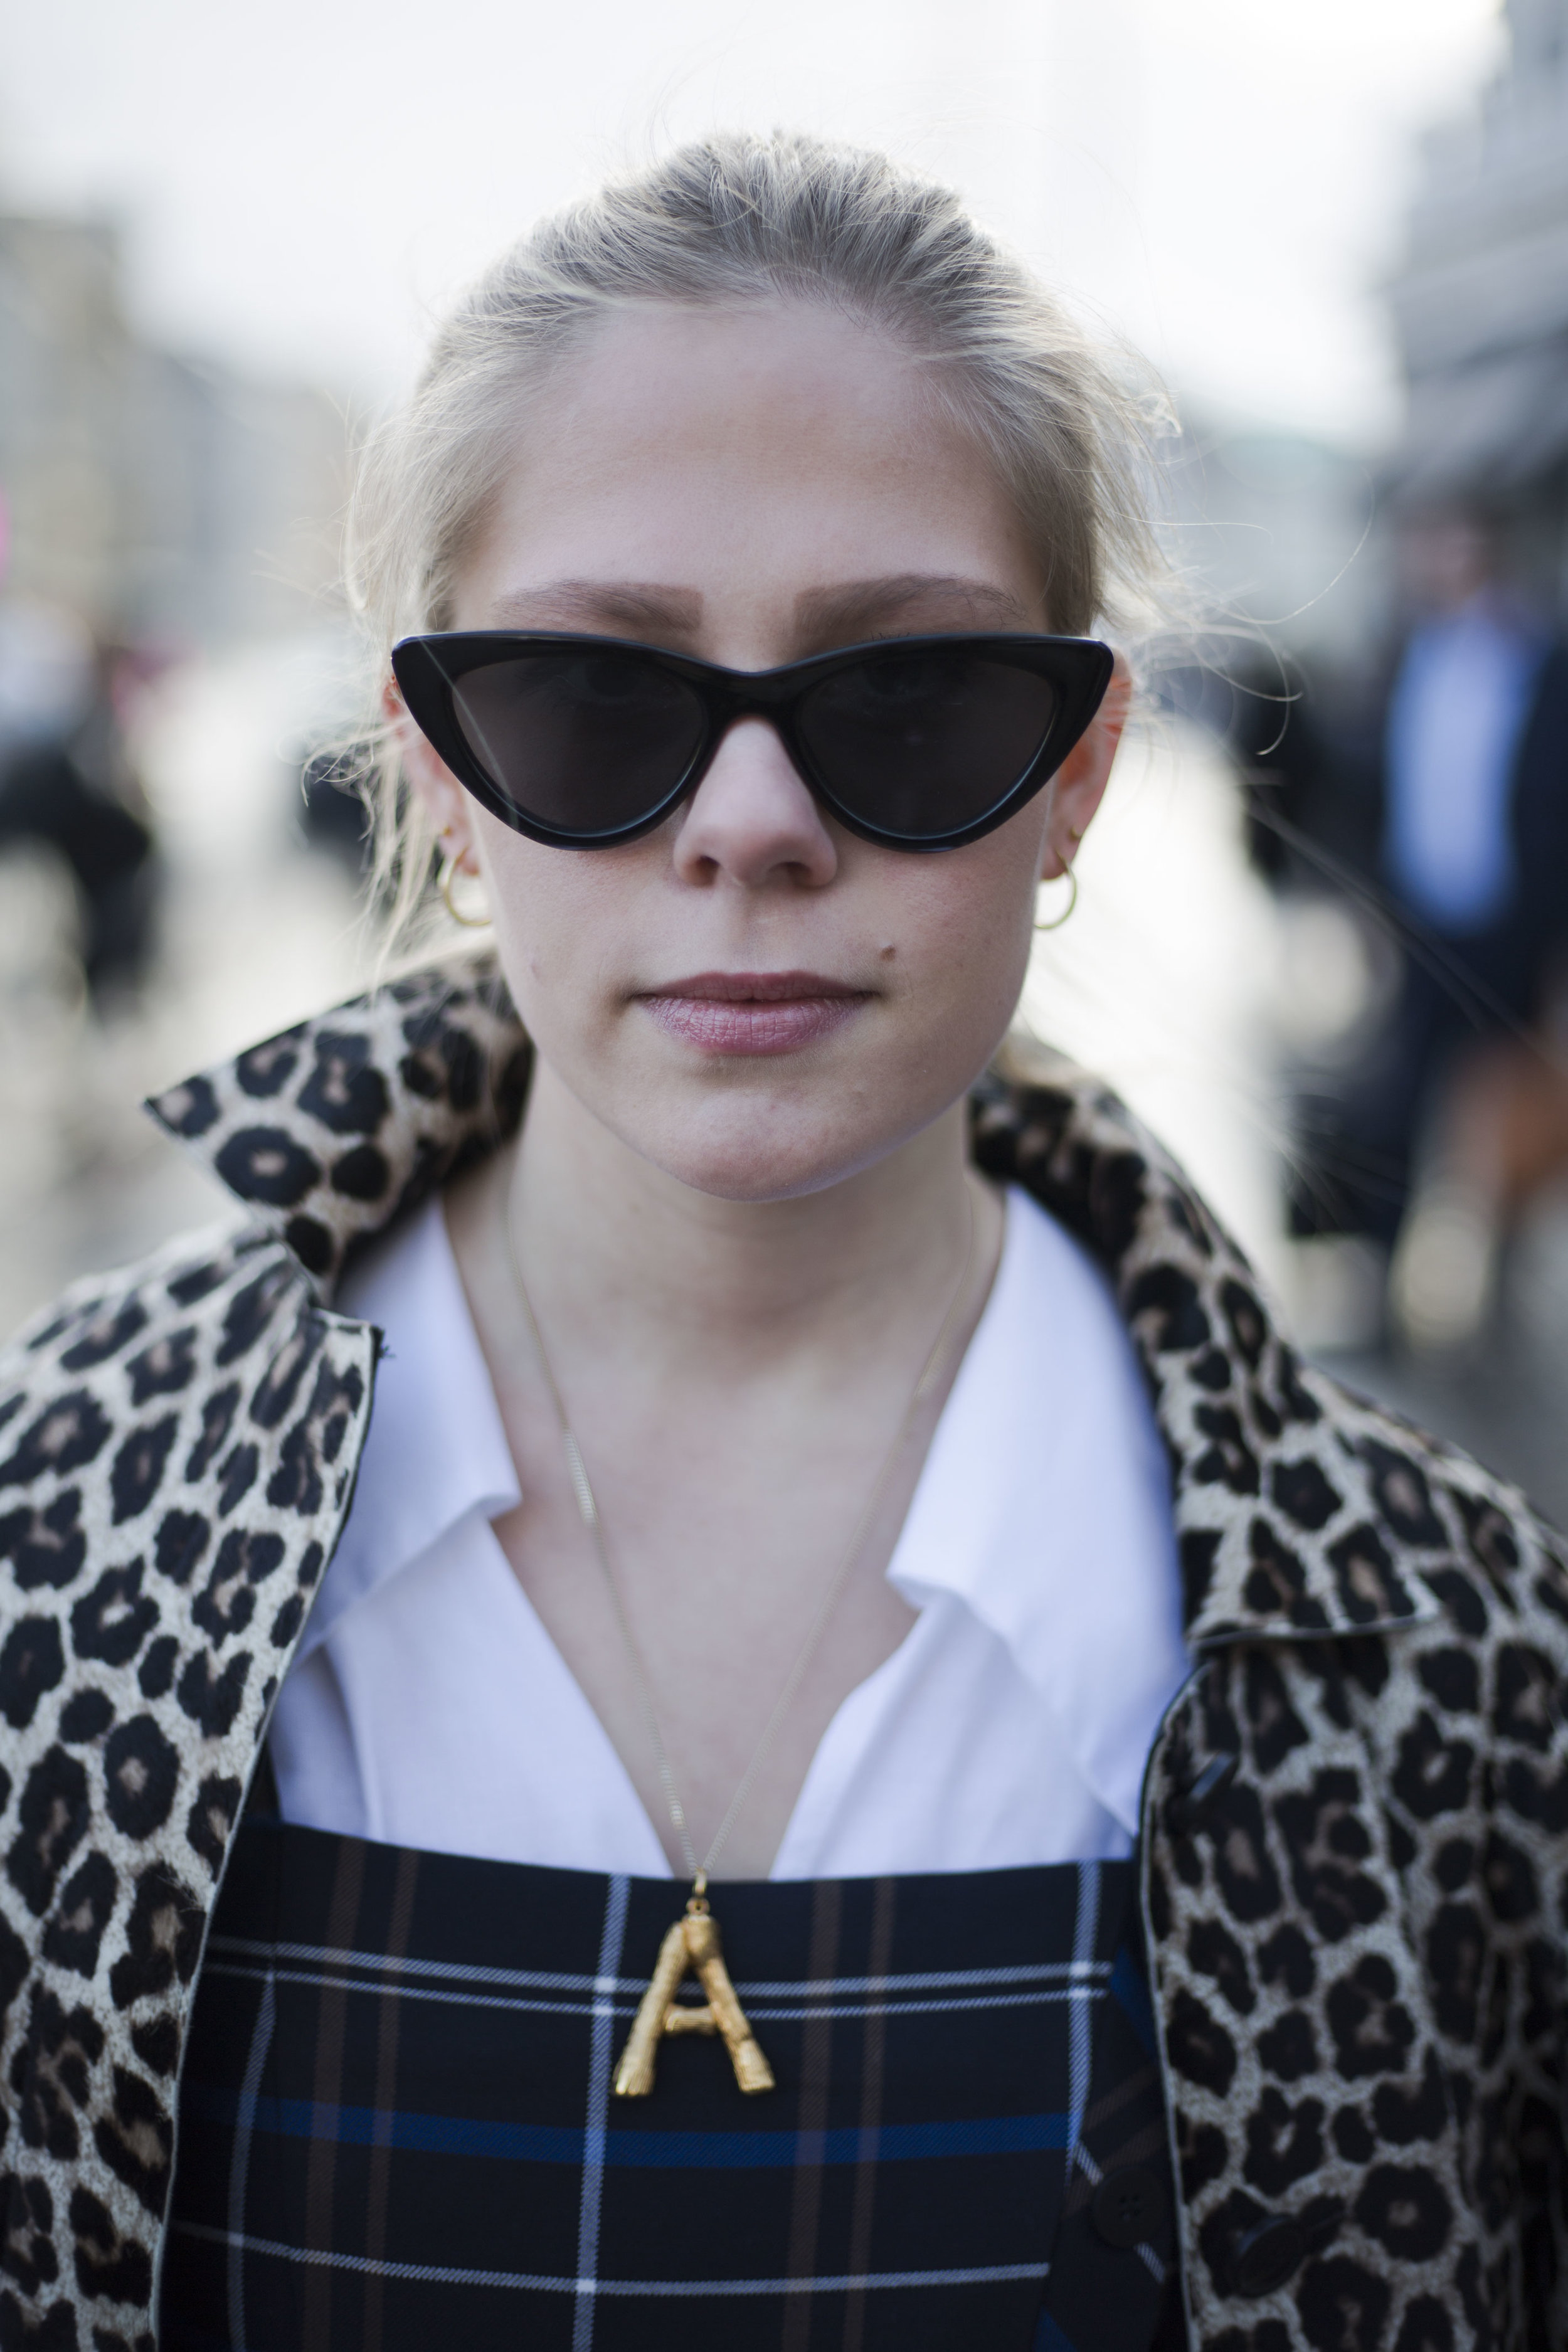 andrea-rognstad-annabel-rosendahl-copenhagen-fashionweek-scandinavian-street-style-streetstyle-thestreetland-fashion-best-style.jpg